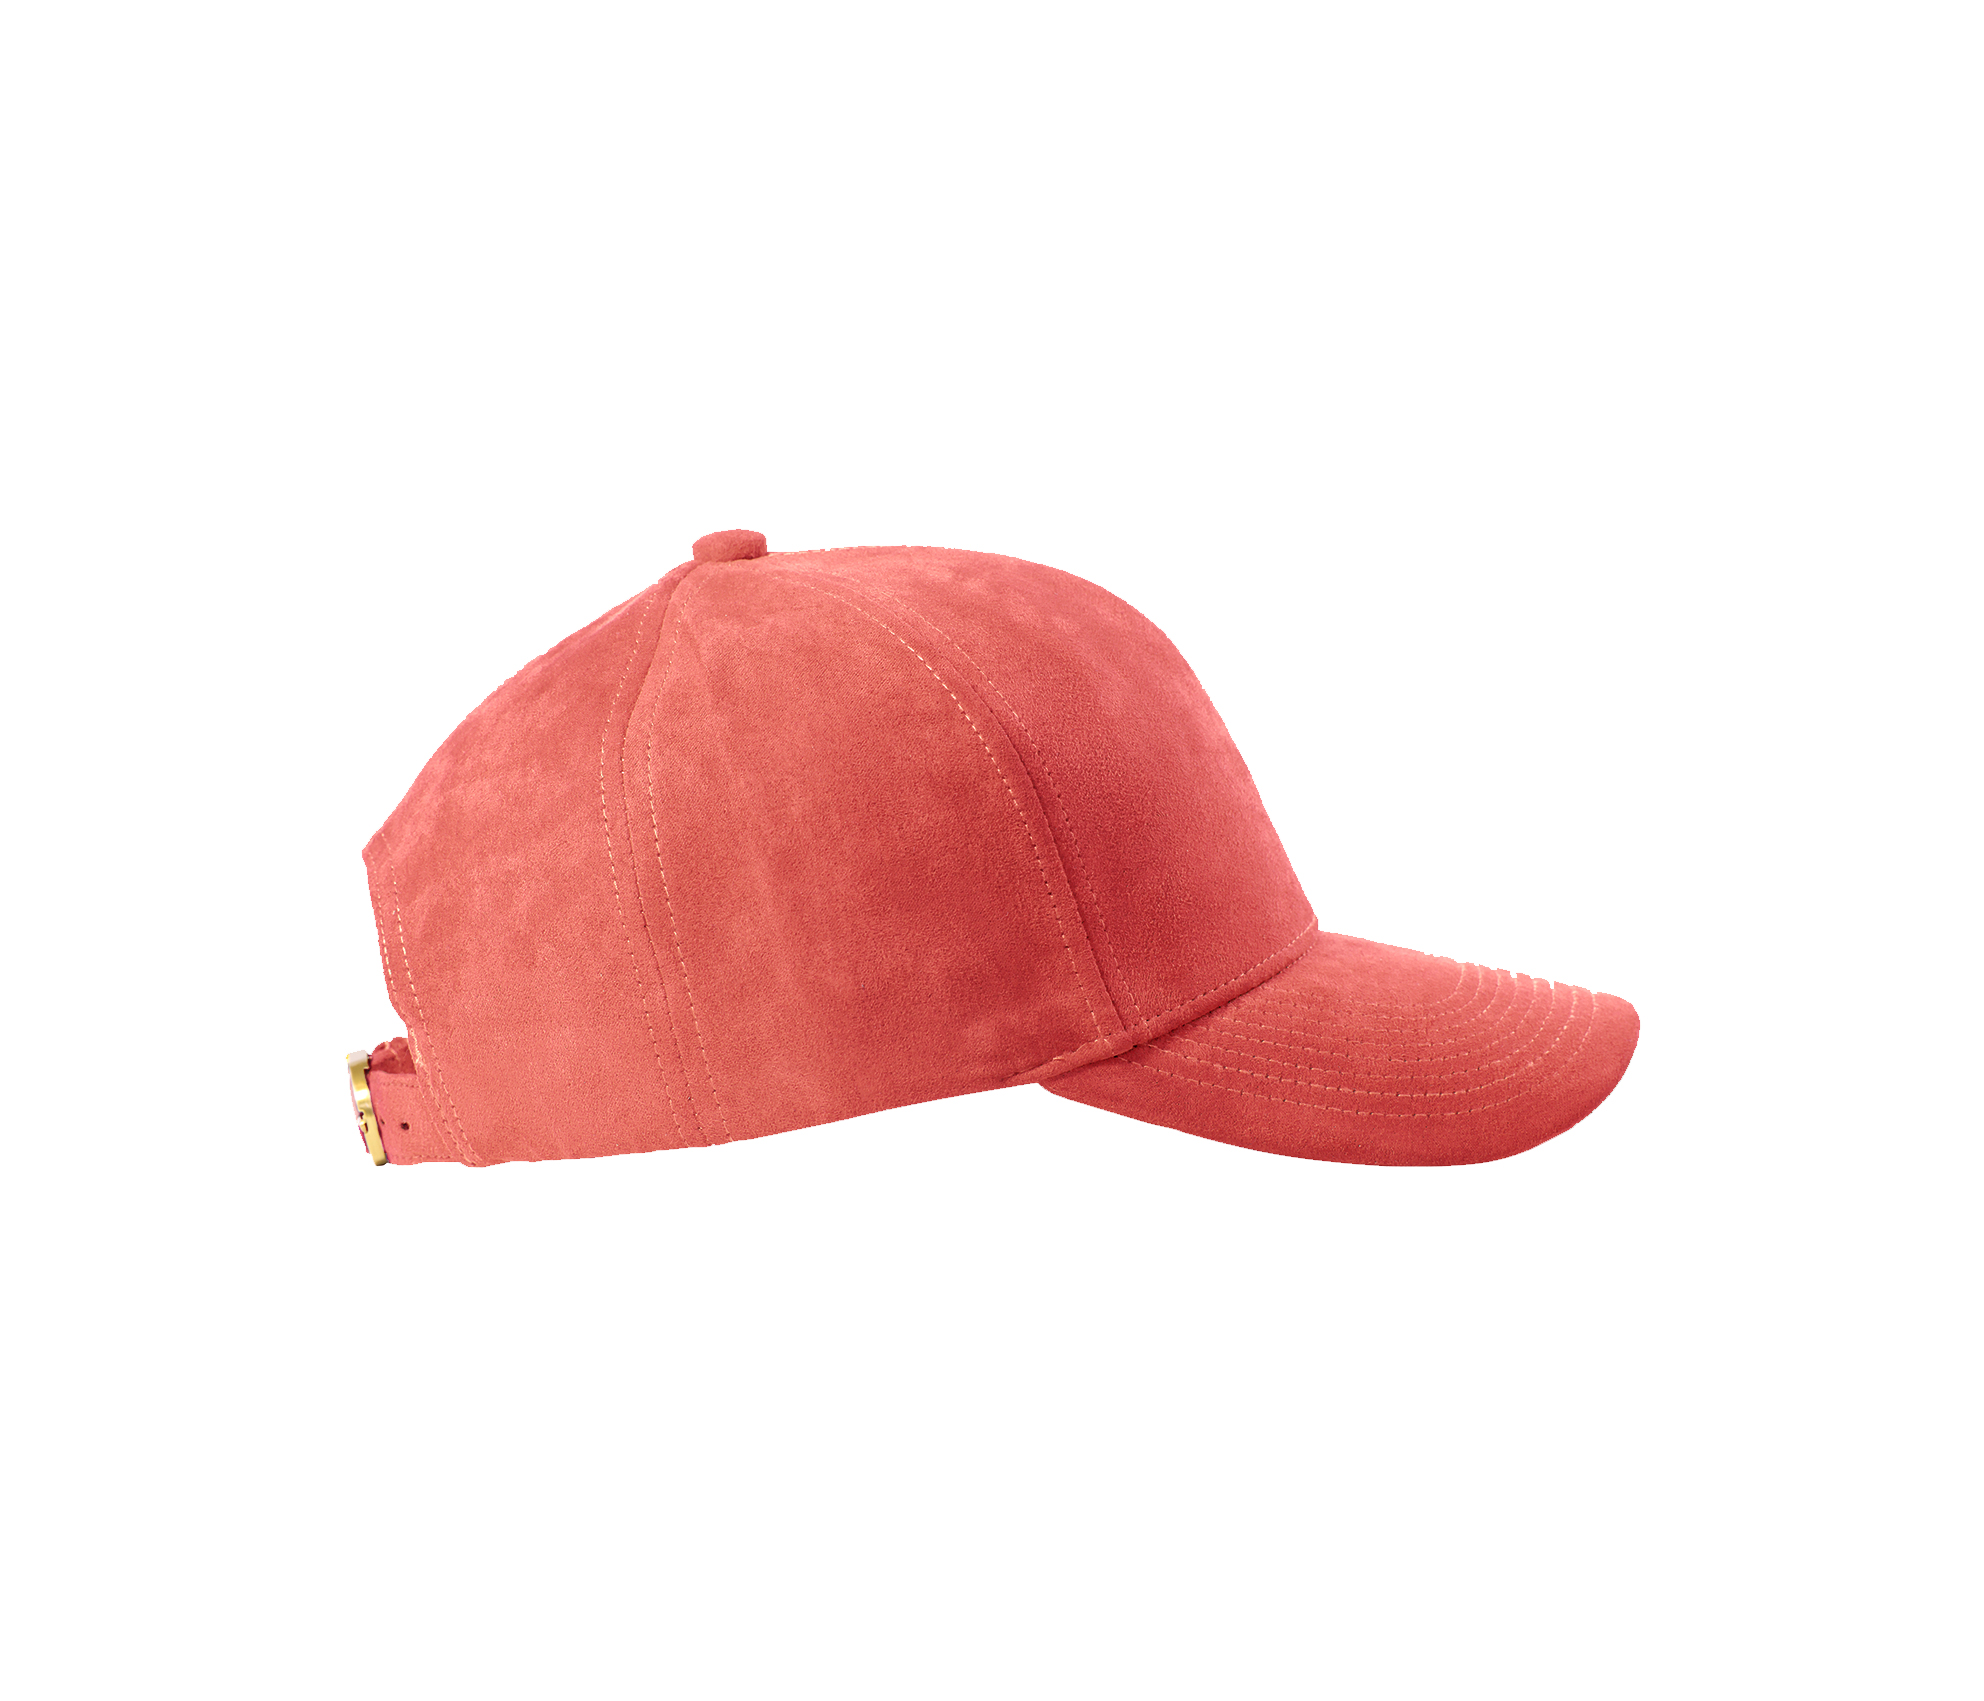 BASEBALL CAP PEACH SUEDE GOLD SIDE